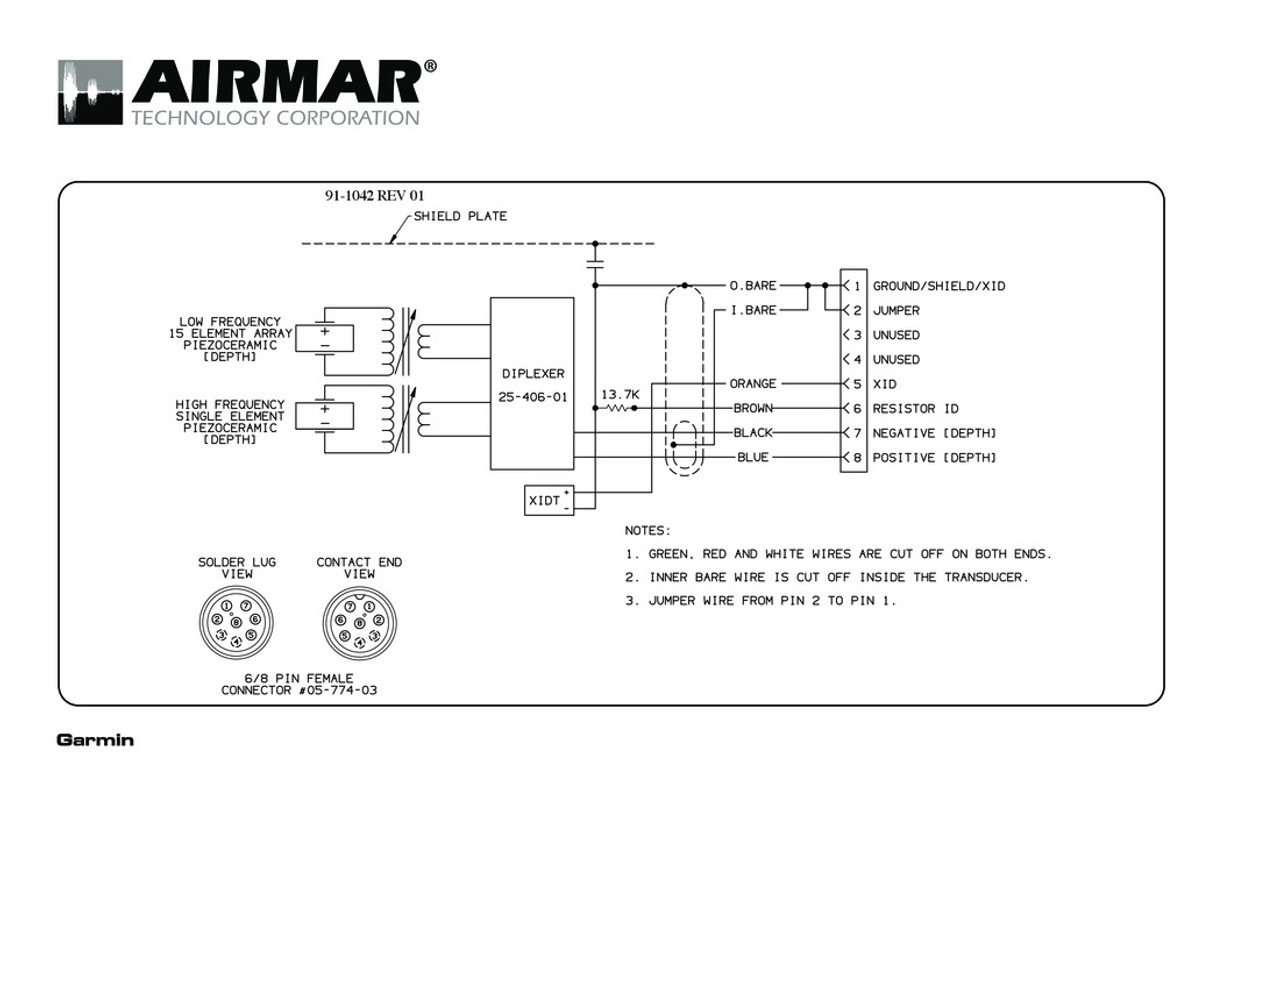 medium resolution of airmar wiring diagram garmin r199 8 pin d t blue bottle marine 8